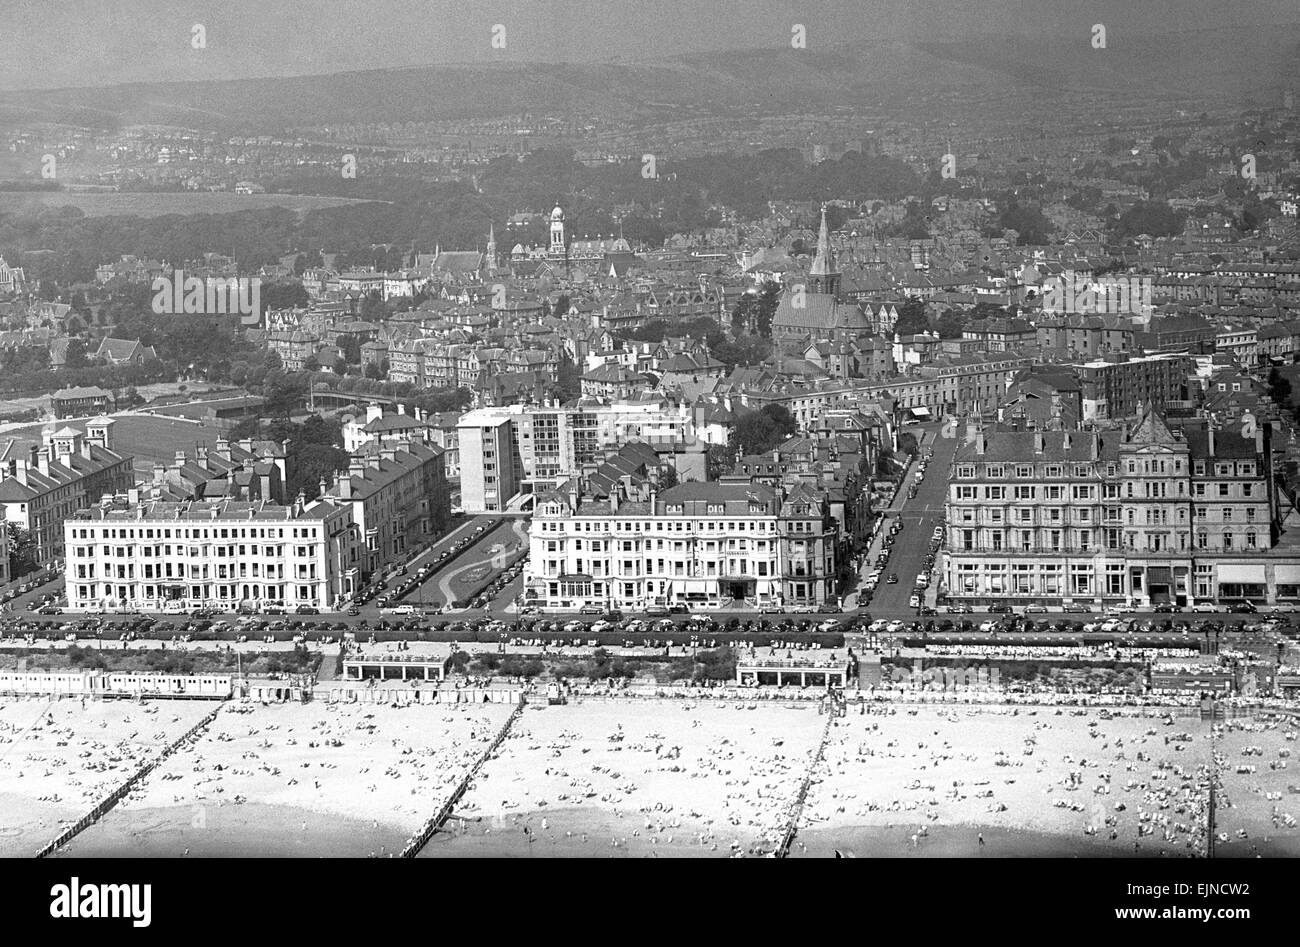 Eastbourne, East Sussex, 4. August 1957. Stockbild